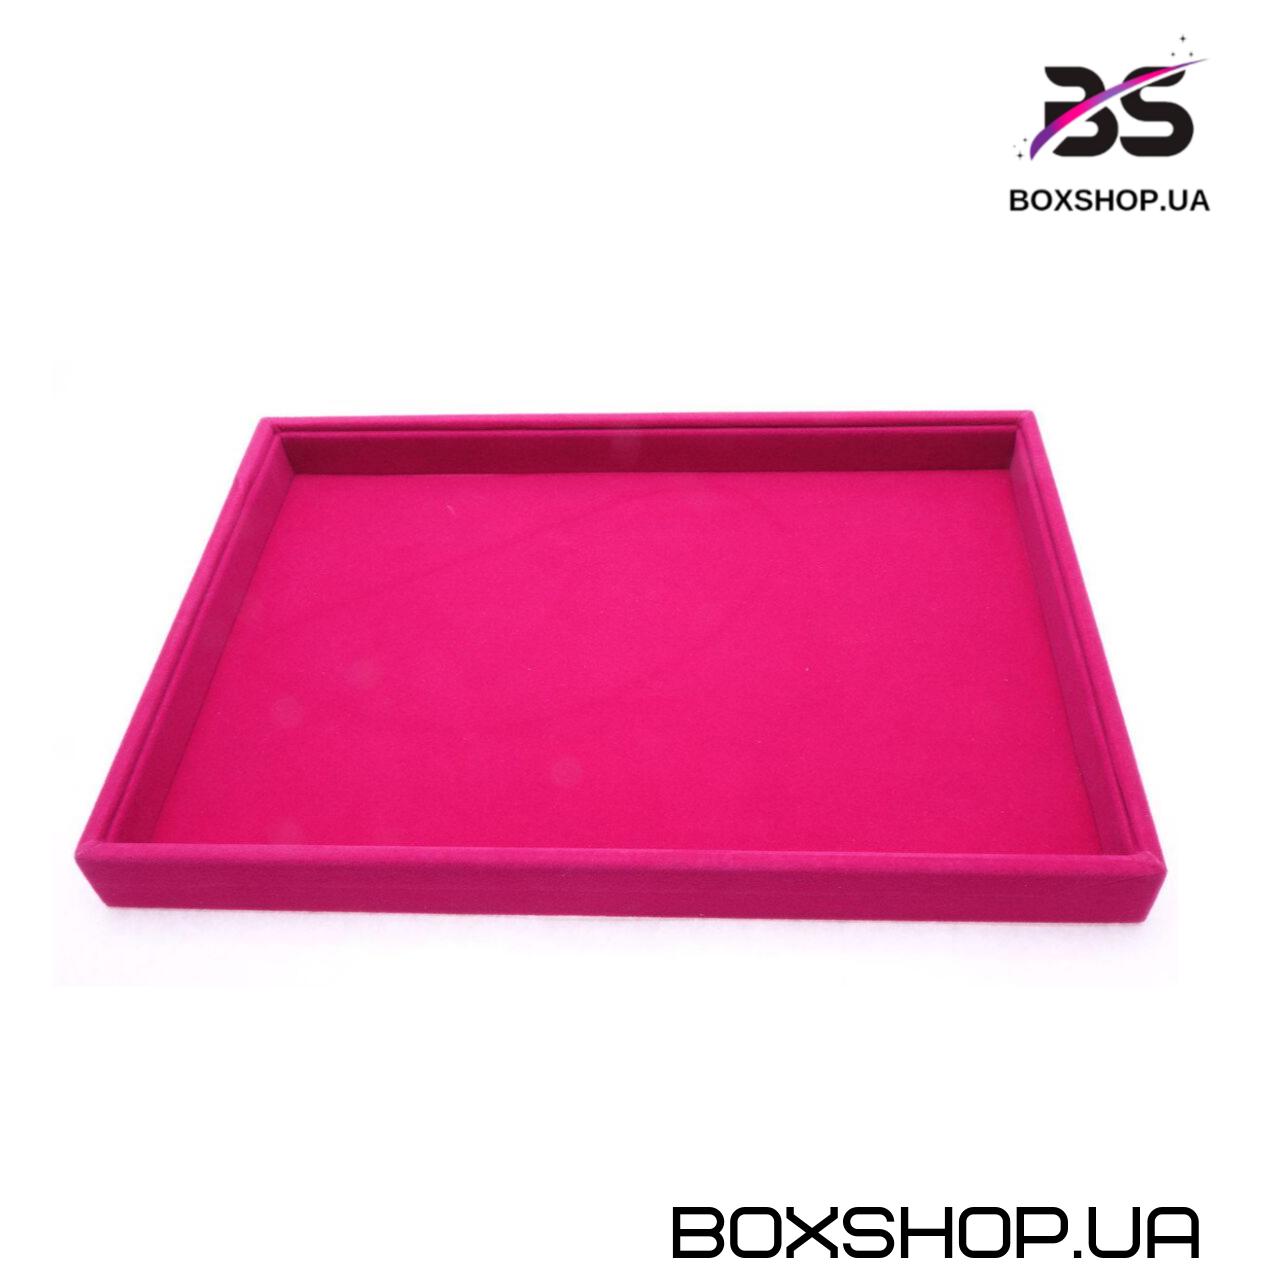 Ювелирный планшет-презентер BOXSHOP - 1022822364